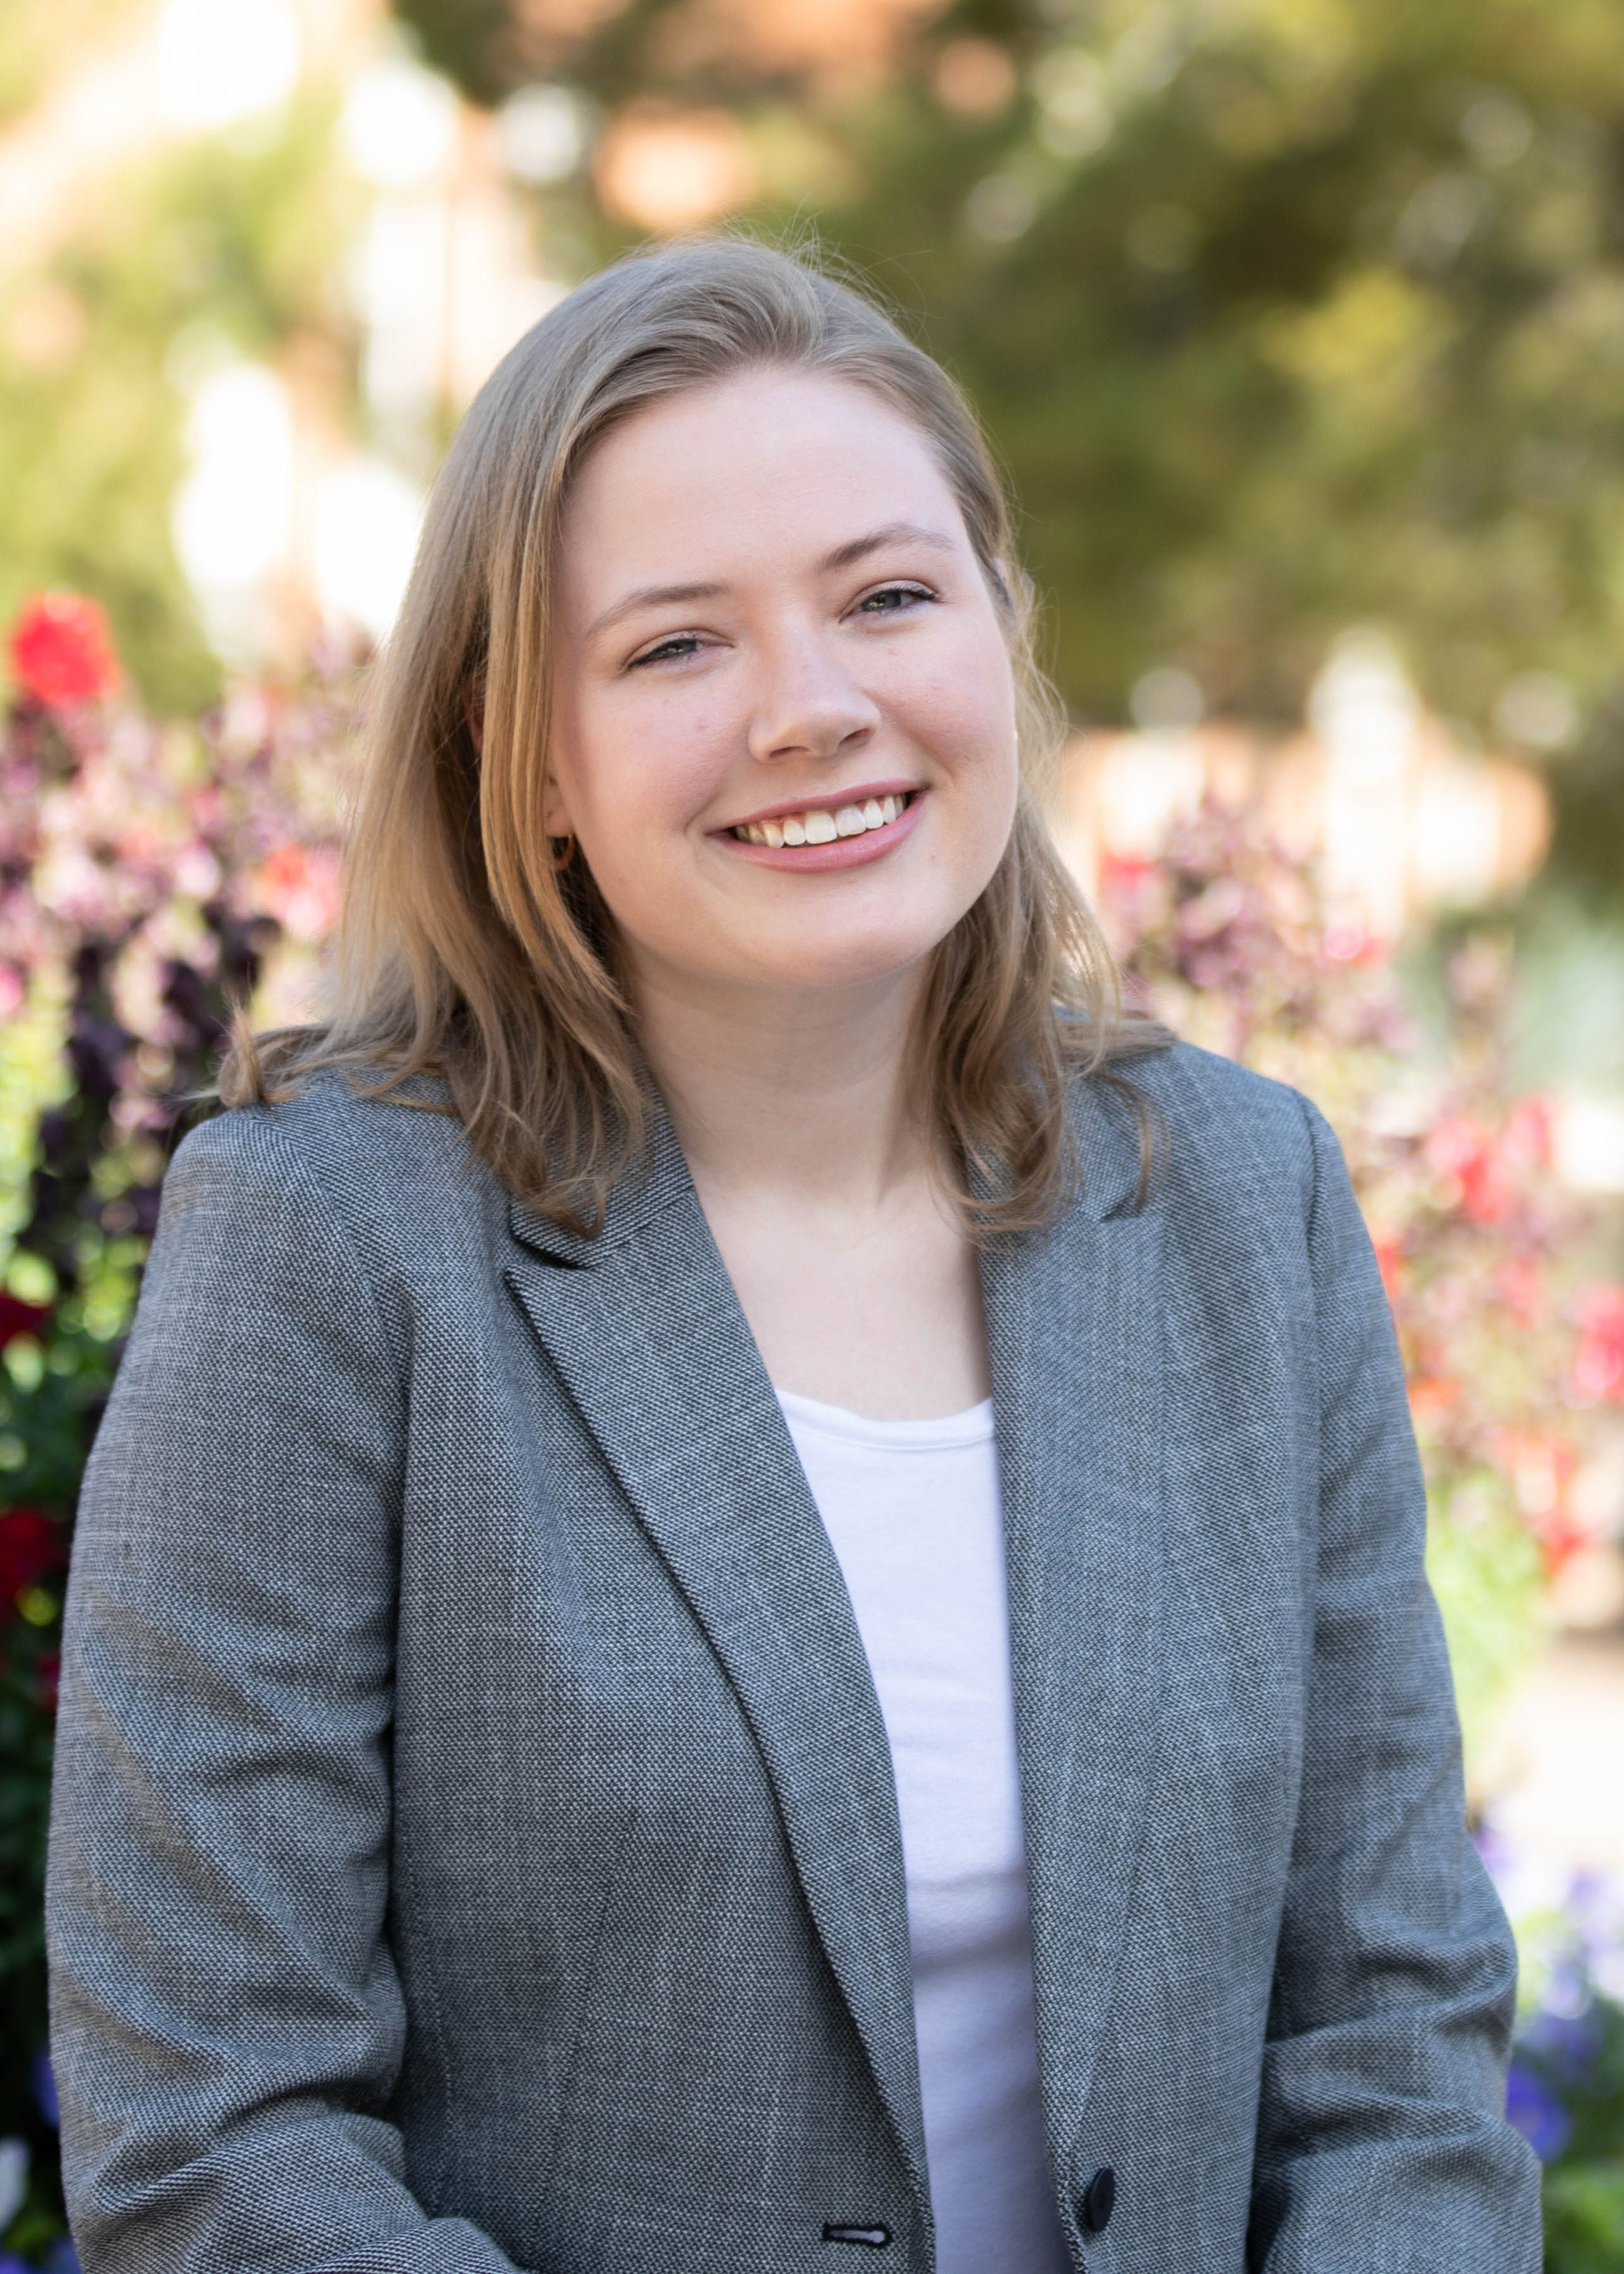 Sarah Stueve